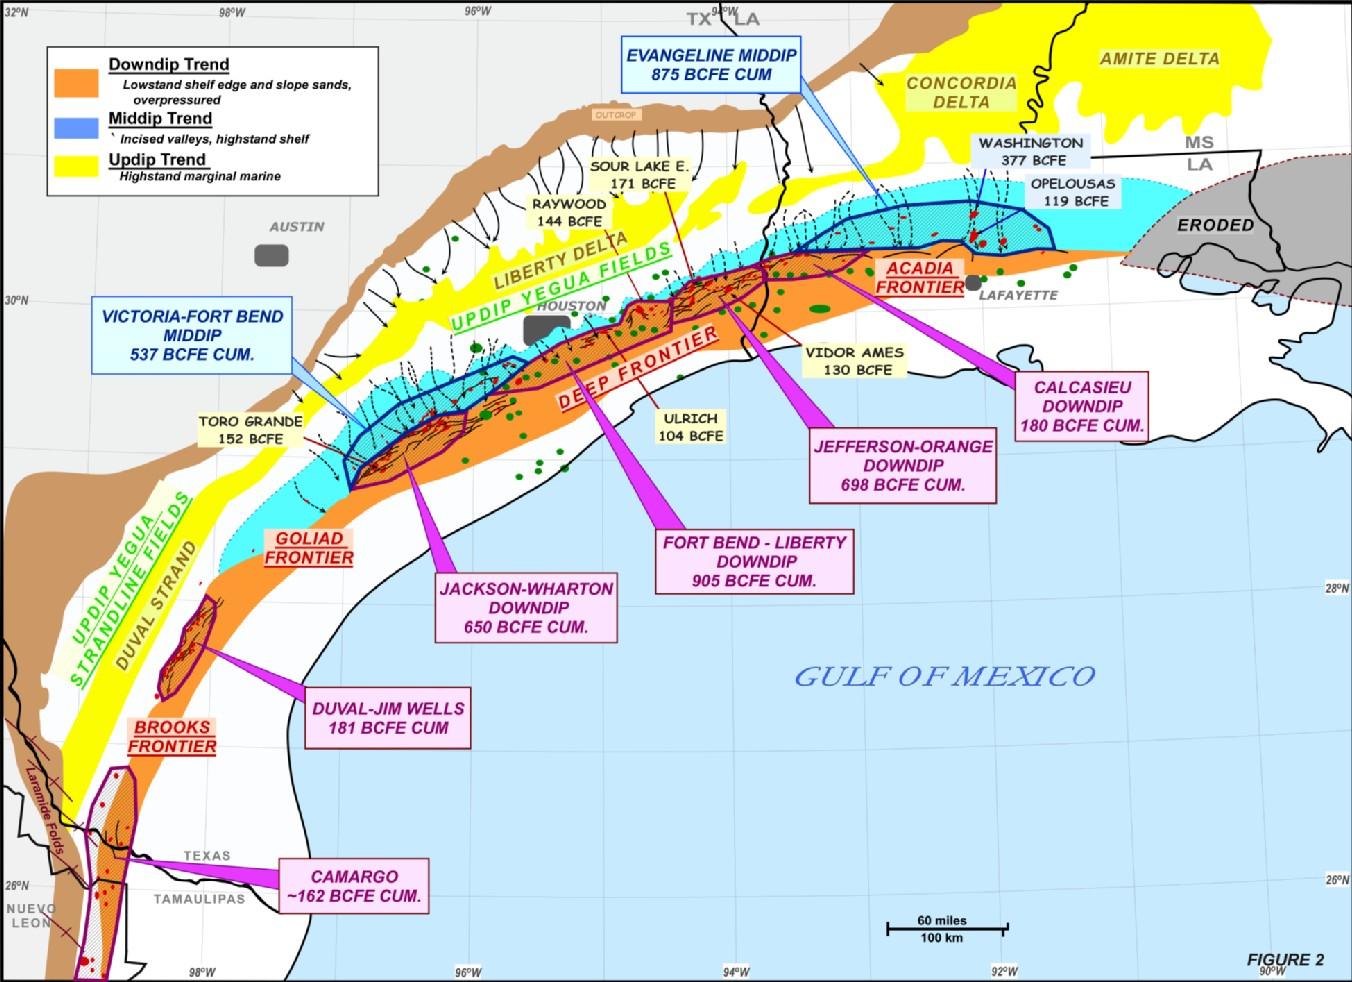 Map Of Texas Coast 16 Map Of The Texas Coastline | Tumejorgestion - Map Of Texas Coastline